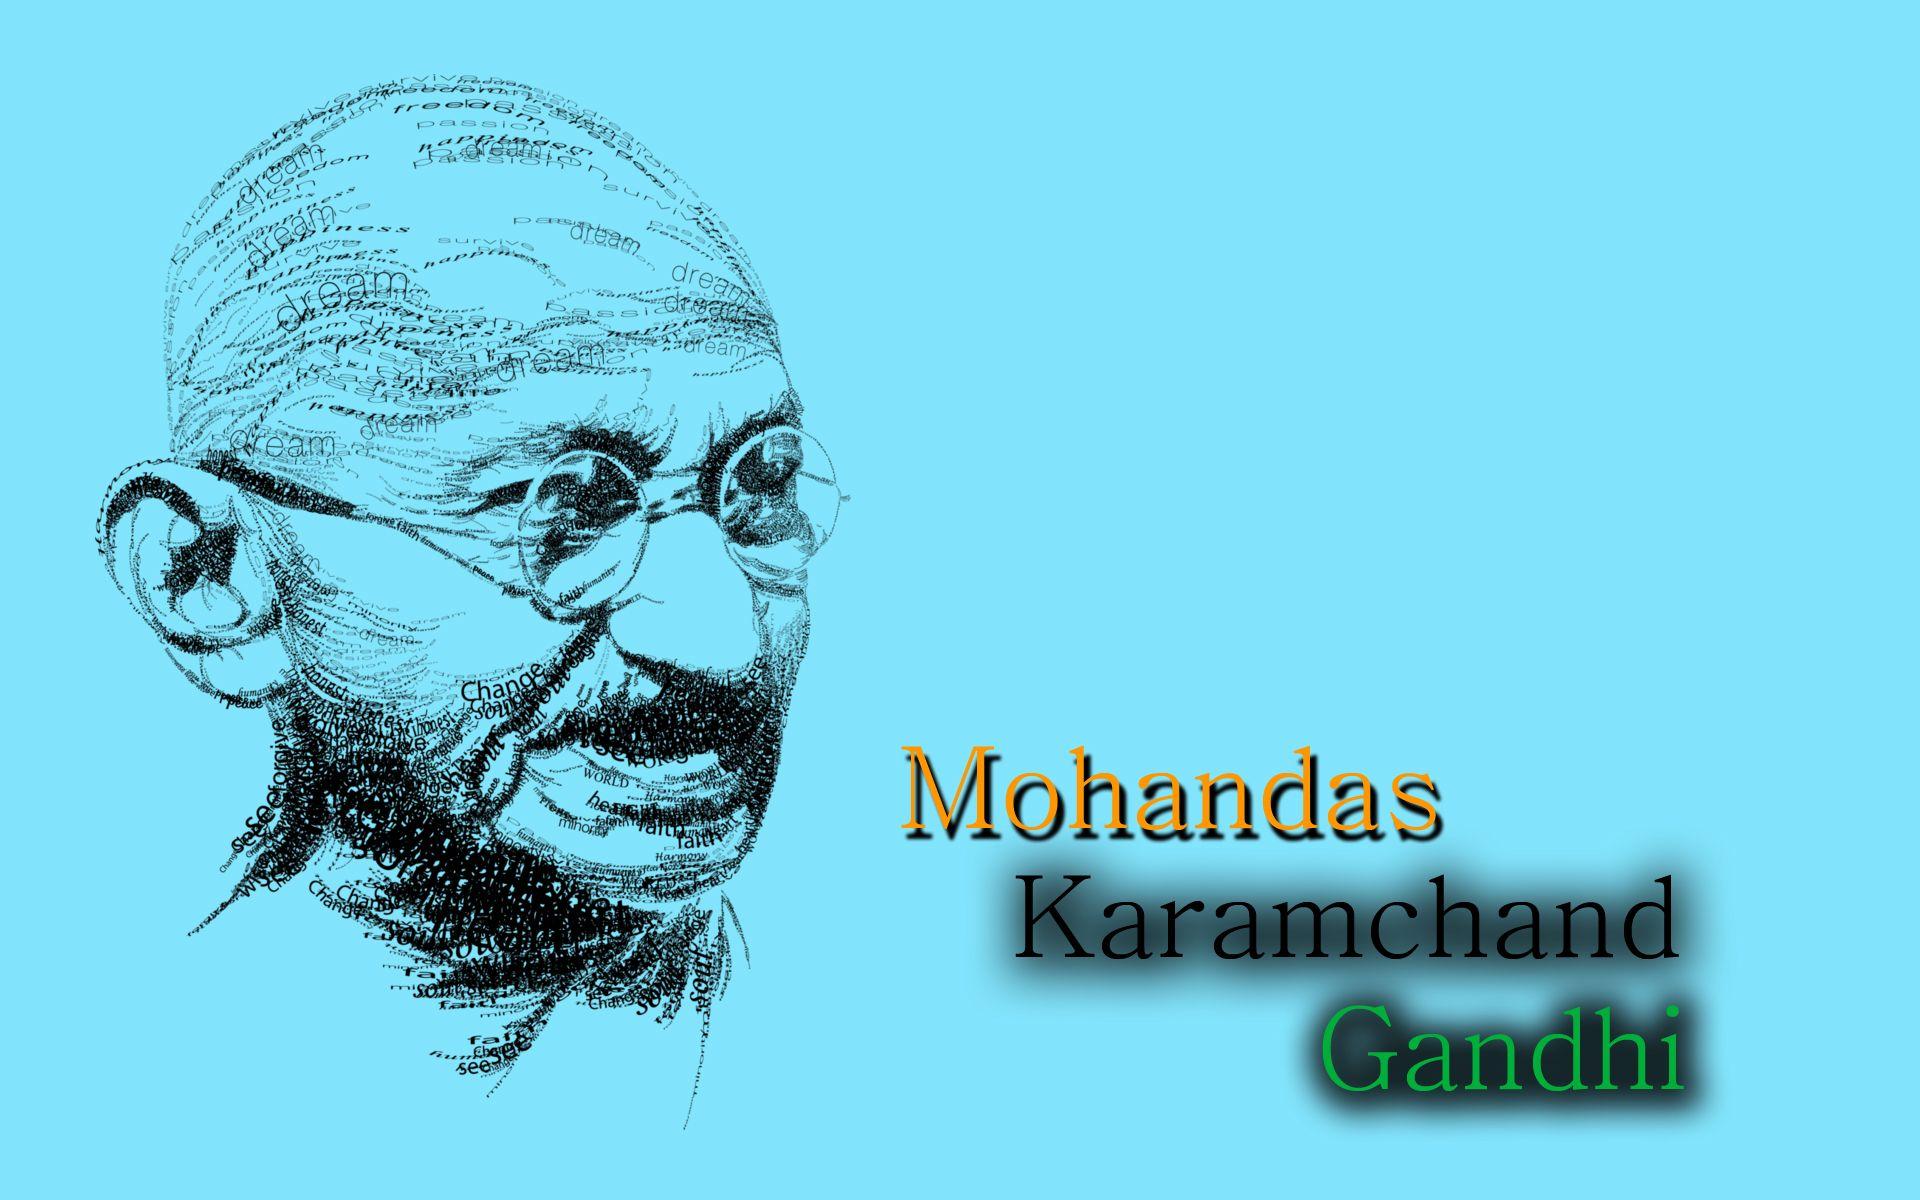 Happy Gandhi Jayanti Wishes Hd Wallpaper Happy Gandhi Jayanti